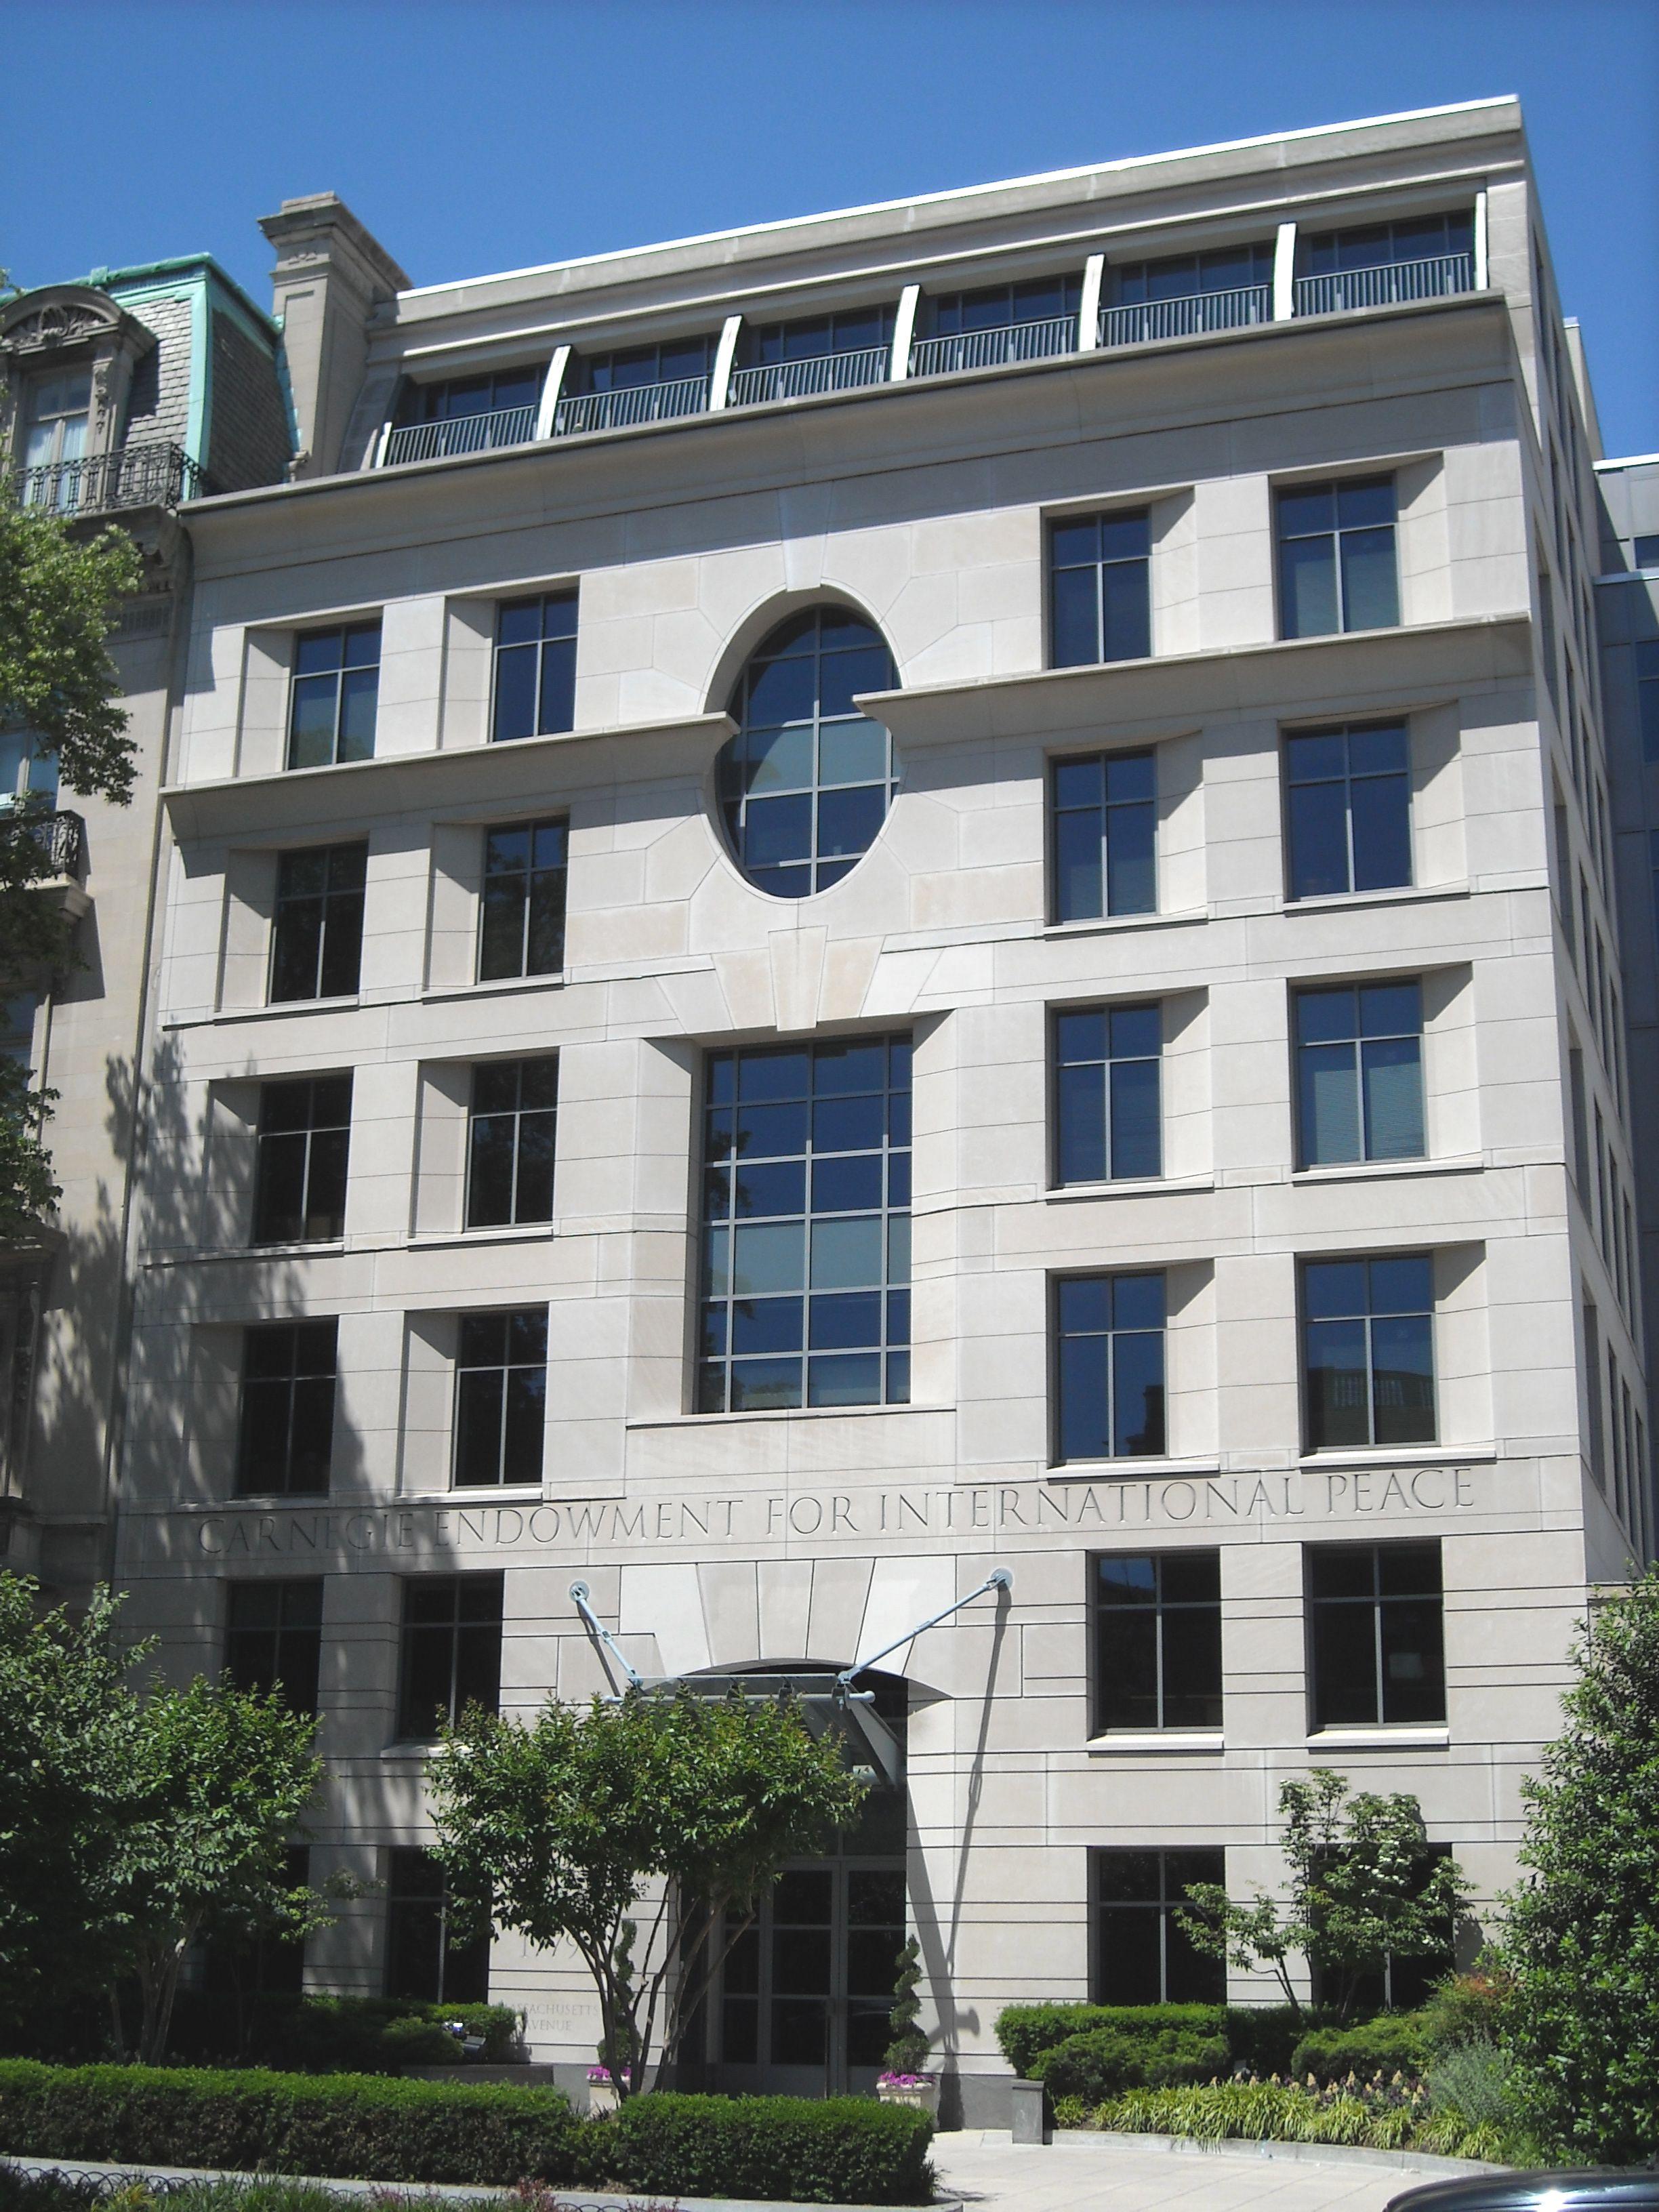 Carnegie Endowment for International Peace